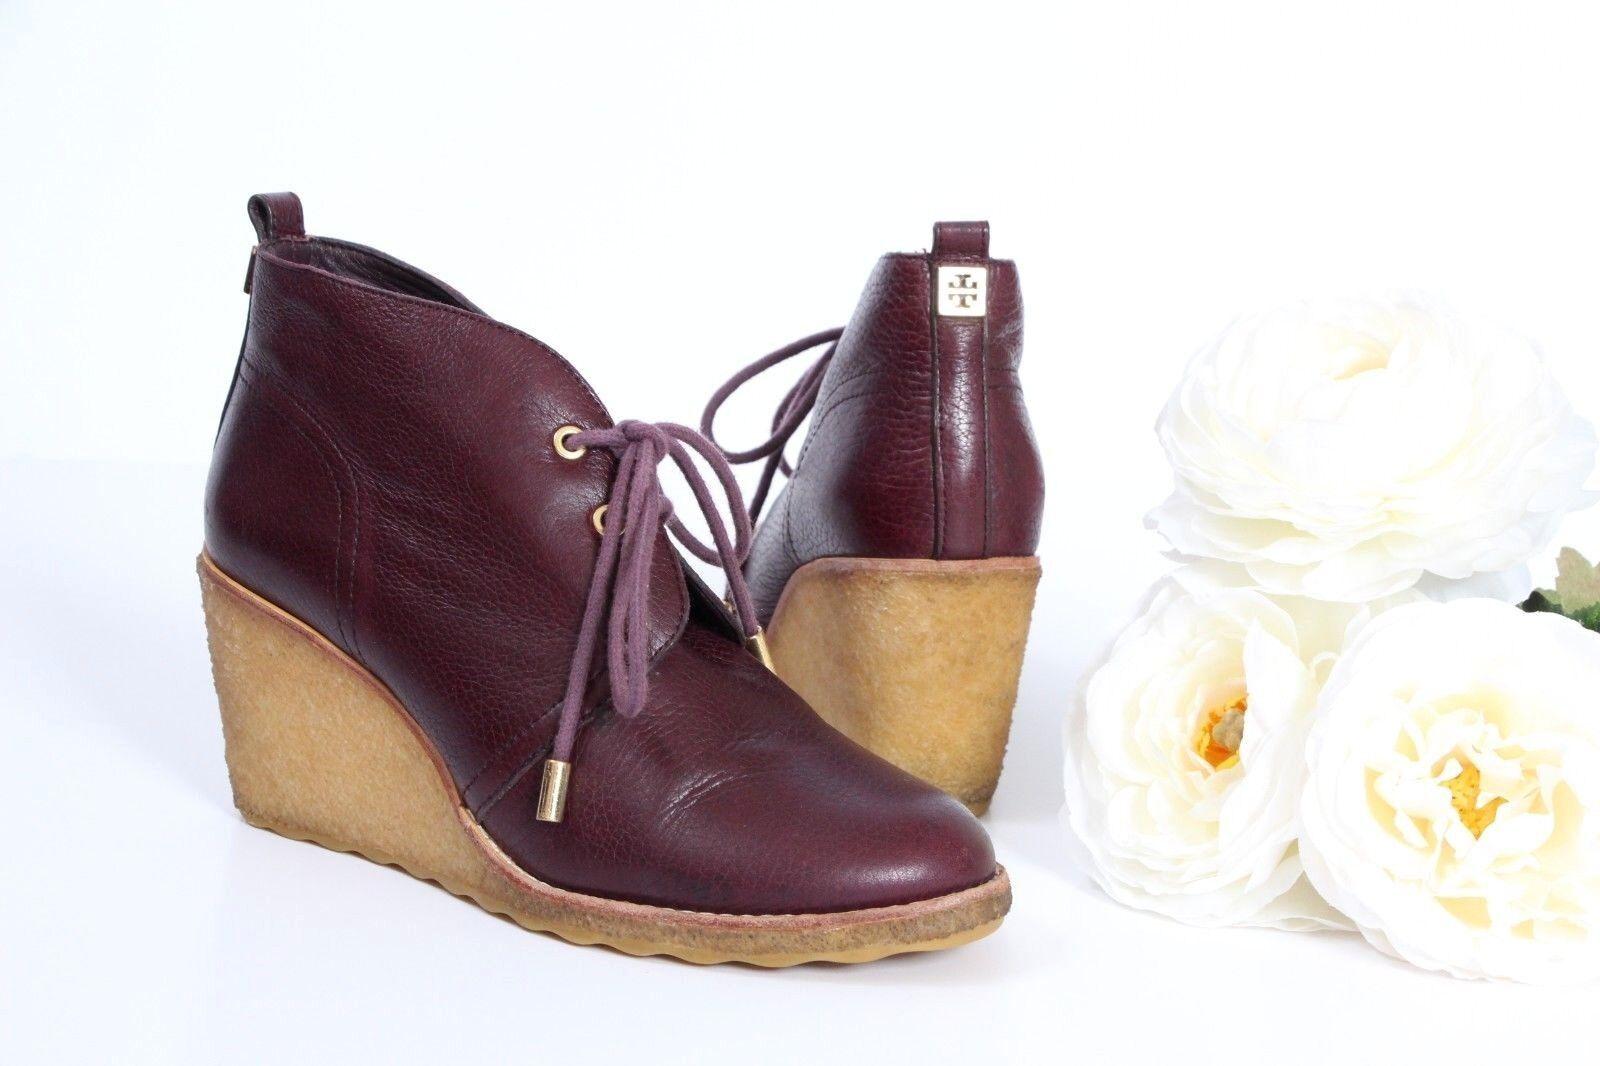 miglior reputazione Tory Tory Tory Burch Vicki Wedge Ankle stivali avvioies 6.5 rosso Leather Fur Luxury  punti vendita